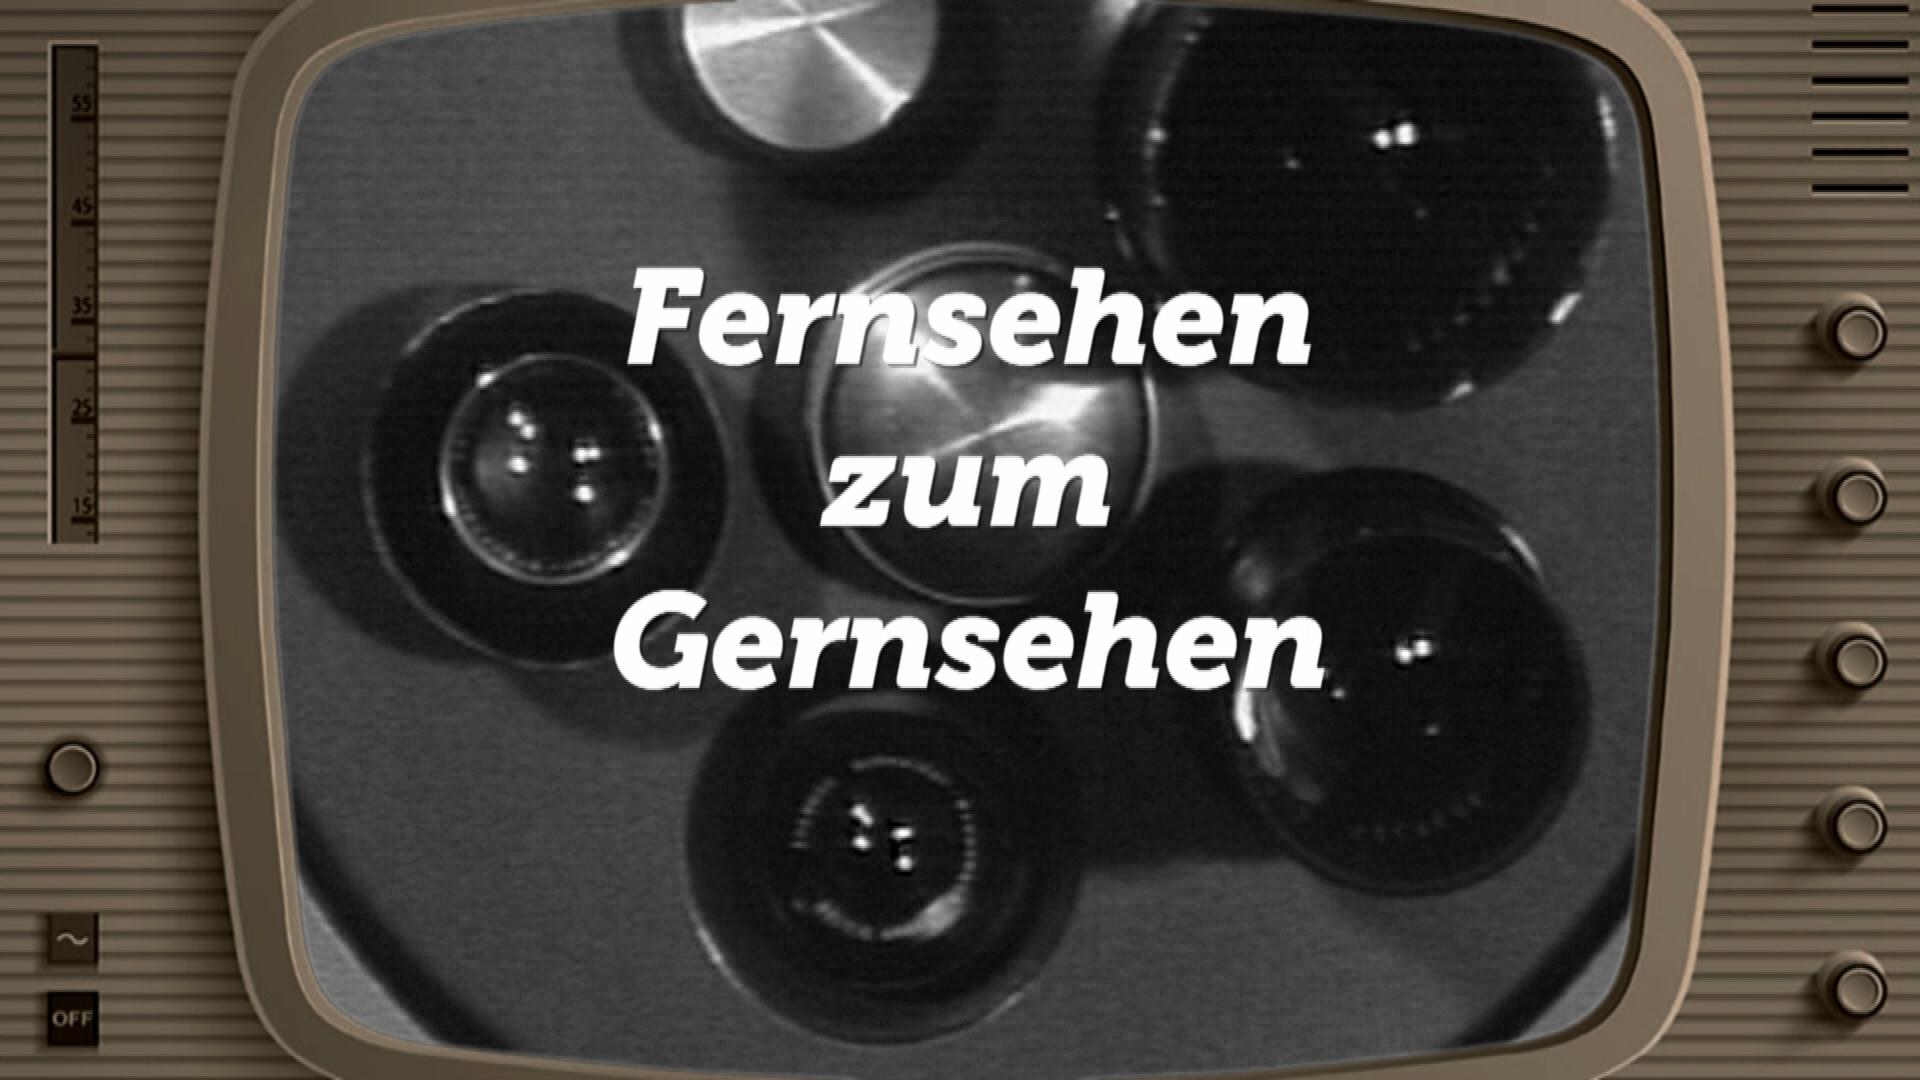 2 Fernsehn zum Gernsehn F01 FINAL 200426 Copy 01